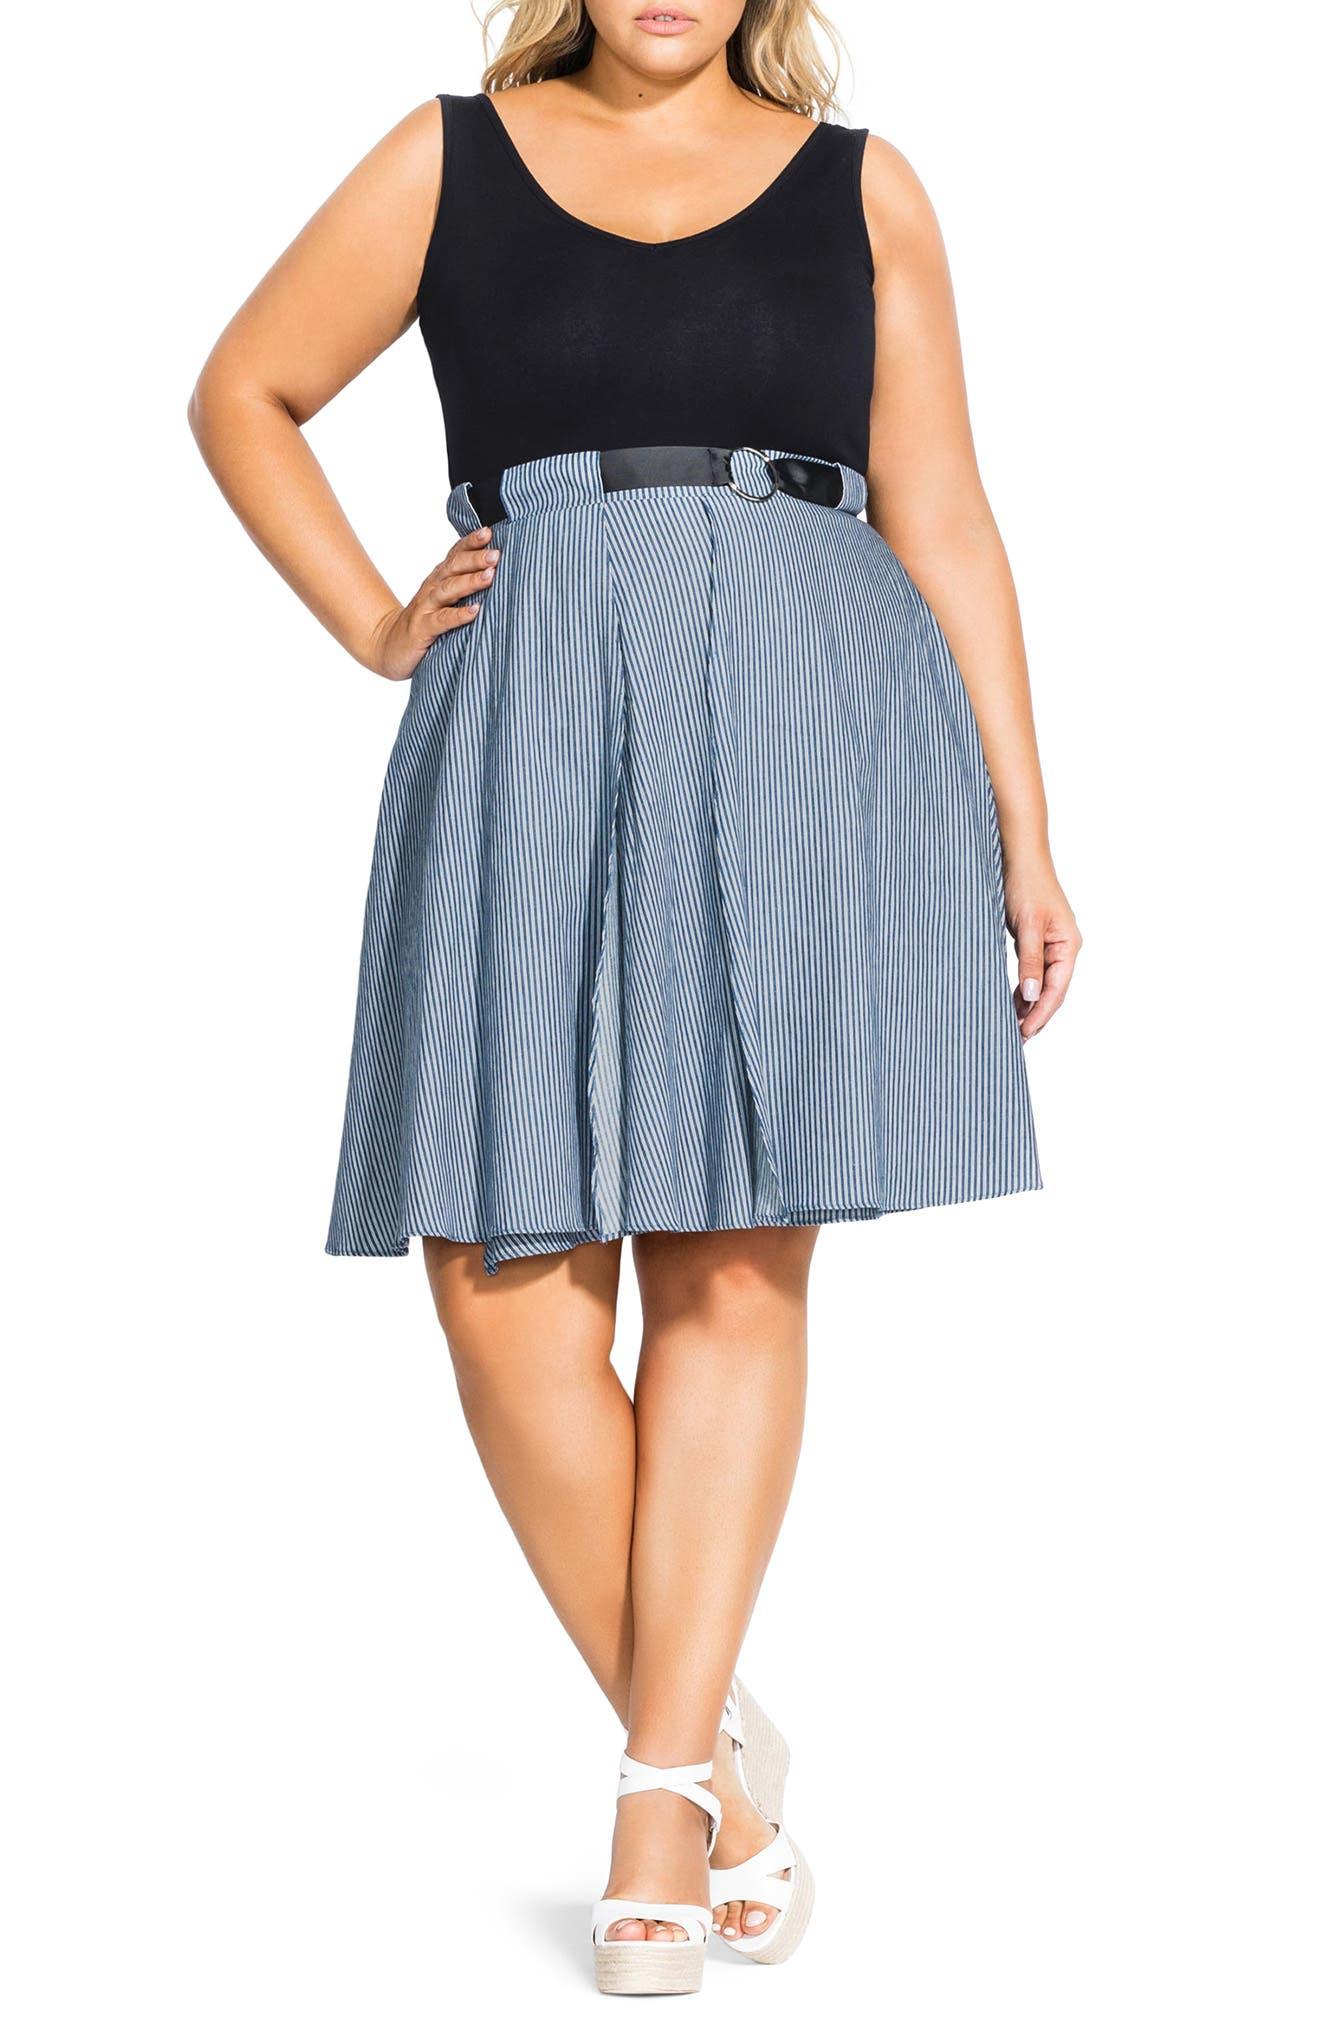 plus size women's city chic mix media belted sleeveless dress